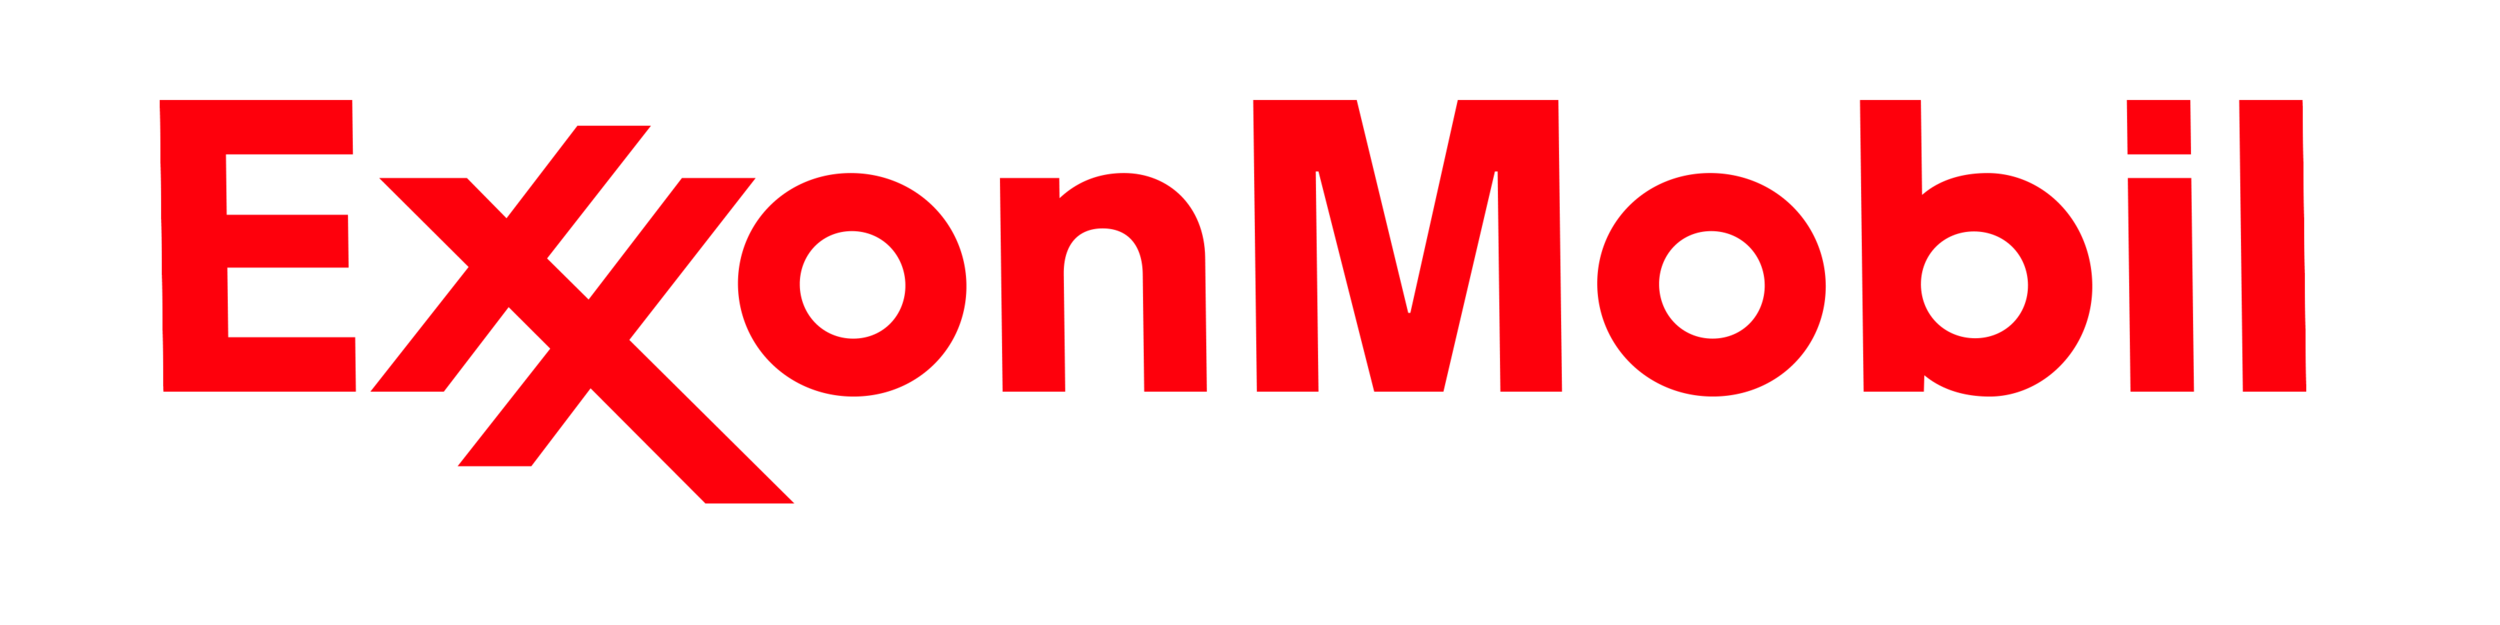 ExxonMobil logo lg.png